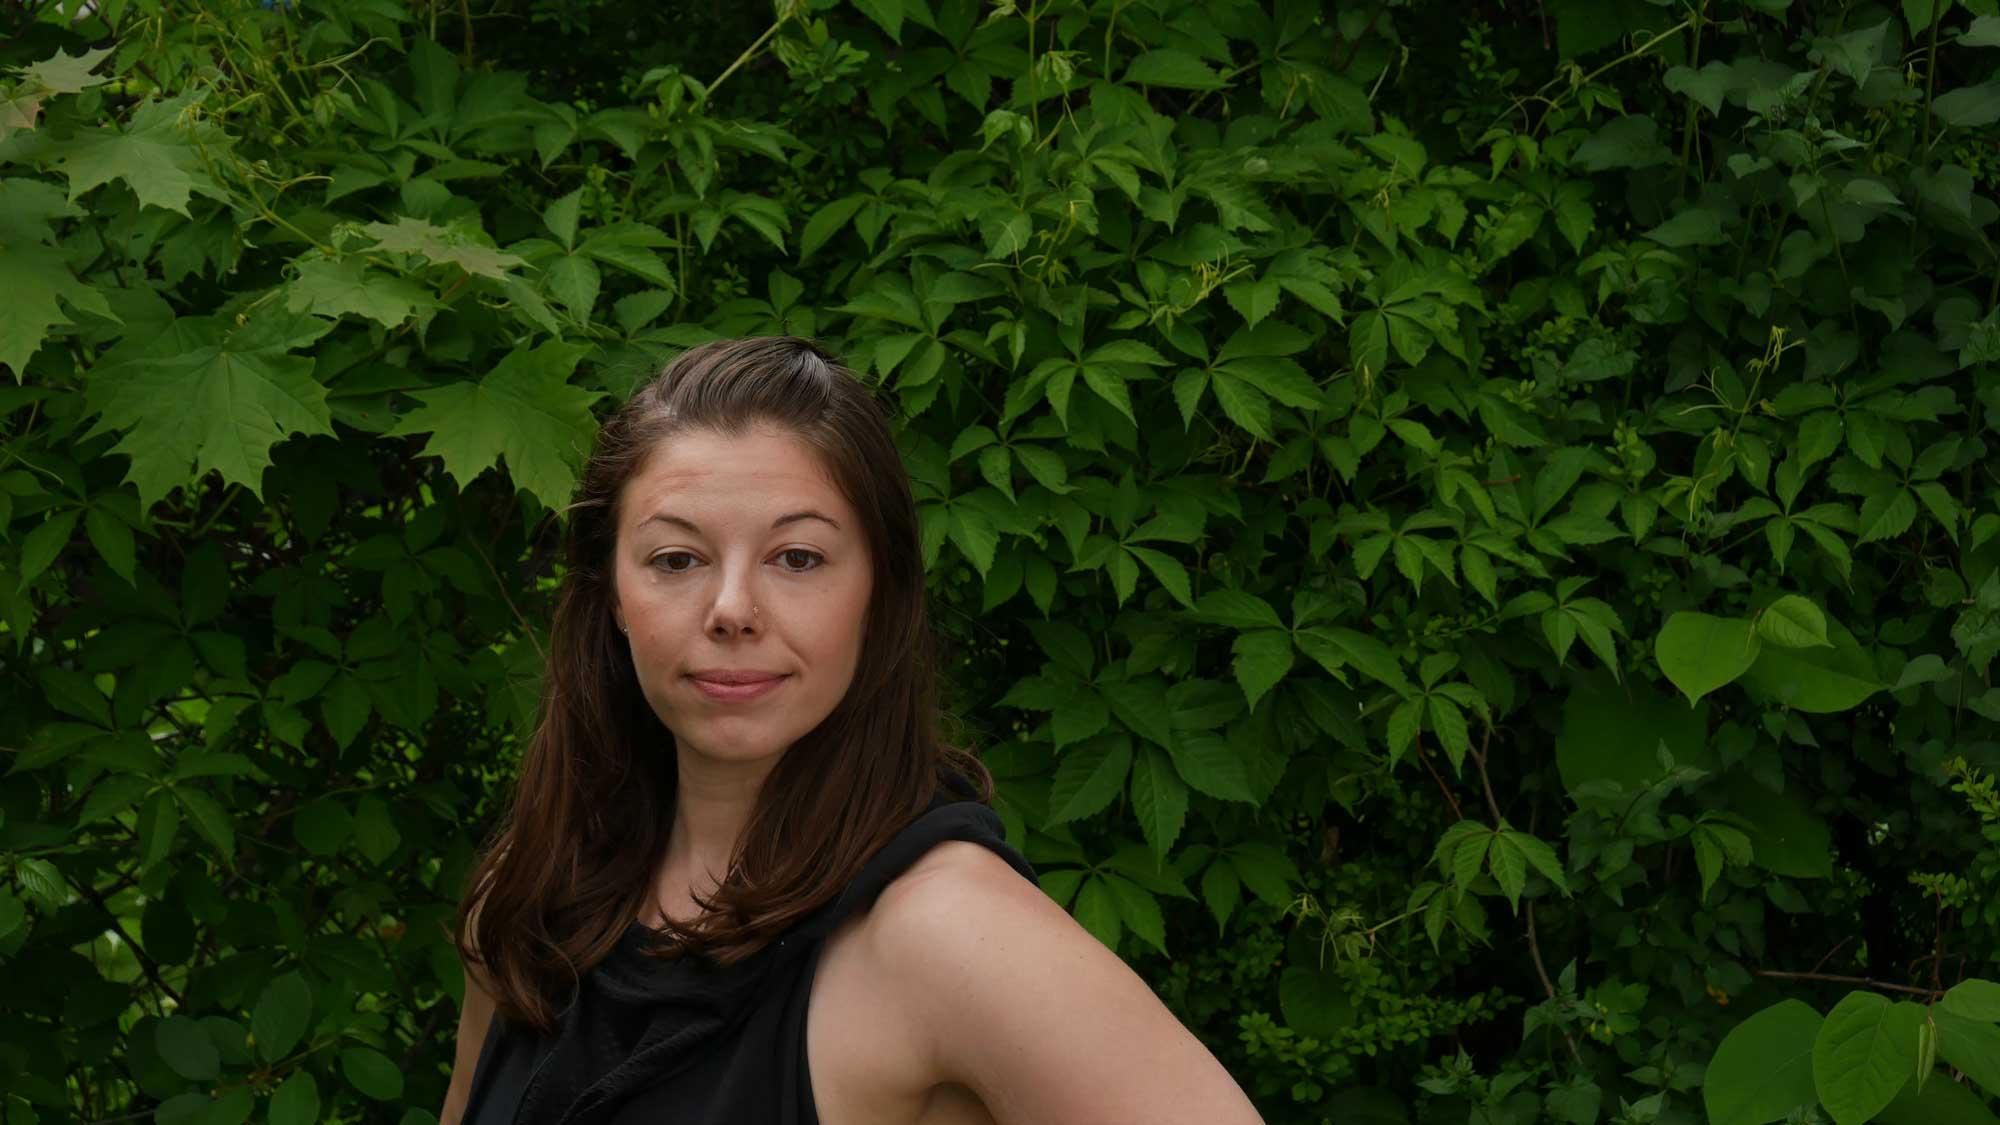 Laurie Maranian Headshot